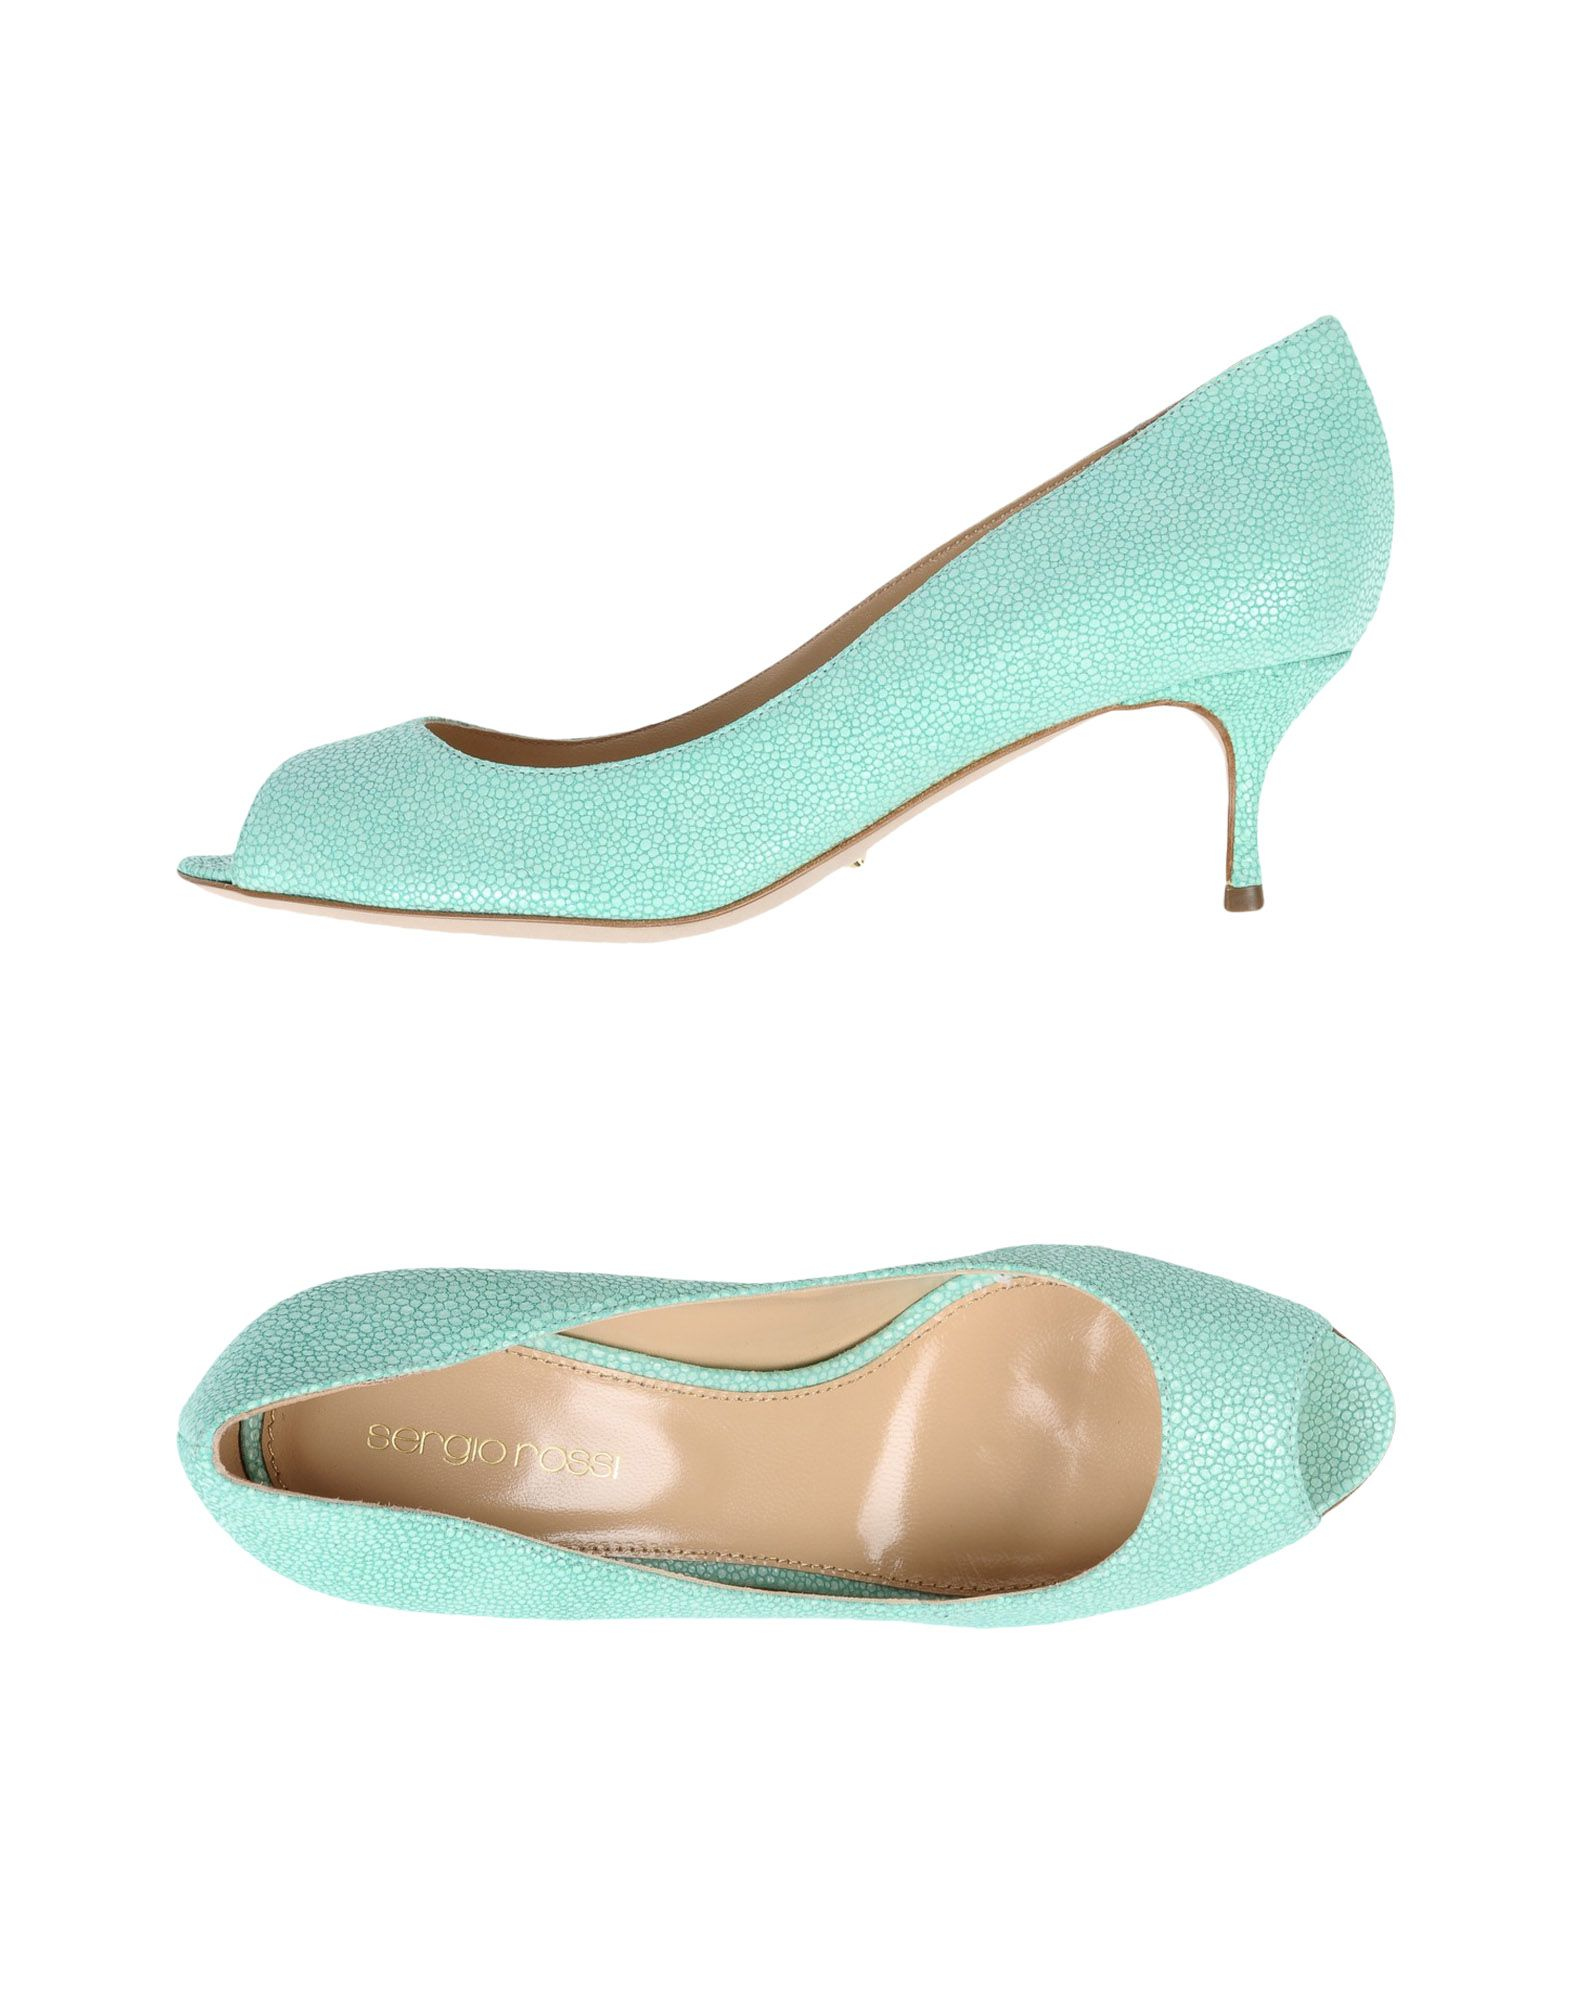 Stilvolle billige Schuhe Sergio Rossi Pumps Damen  11432283HX